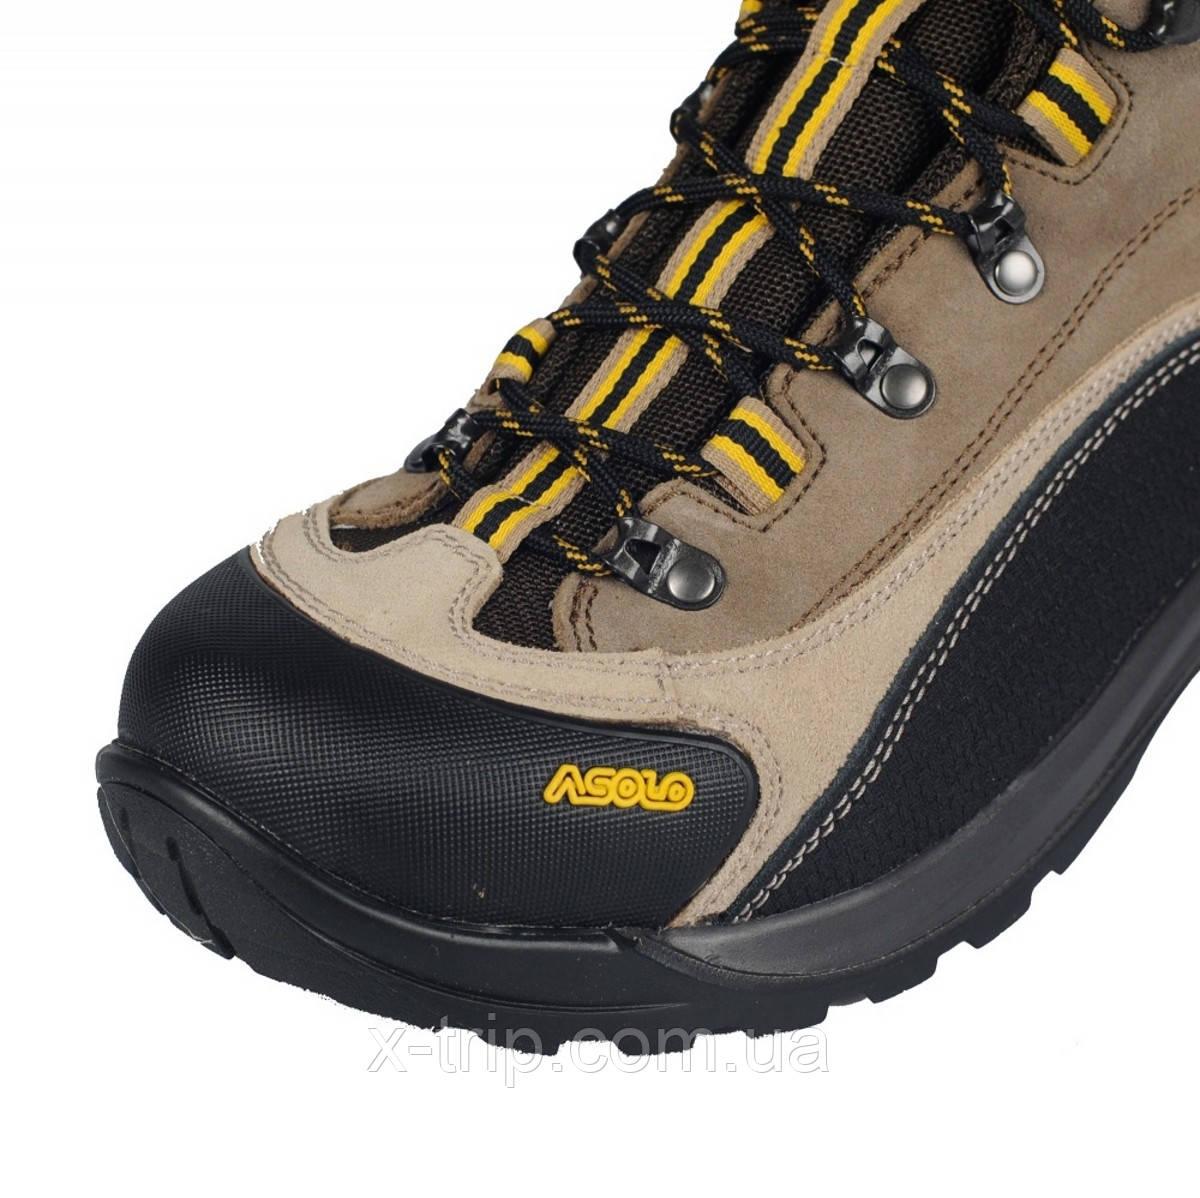 045f322a Треккинговые ботинки Asolo FSN 95 GTX, цена 4 929 грн., купить в Днепре —  Prom.ua (ID#83719020)